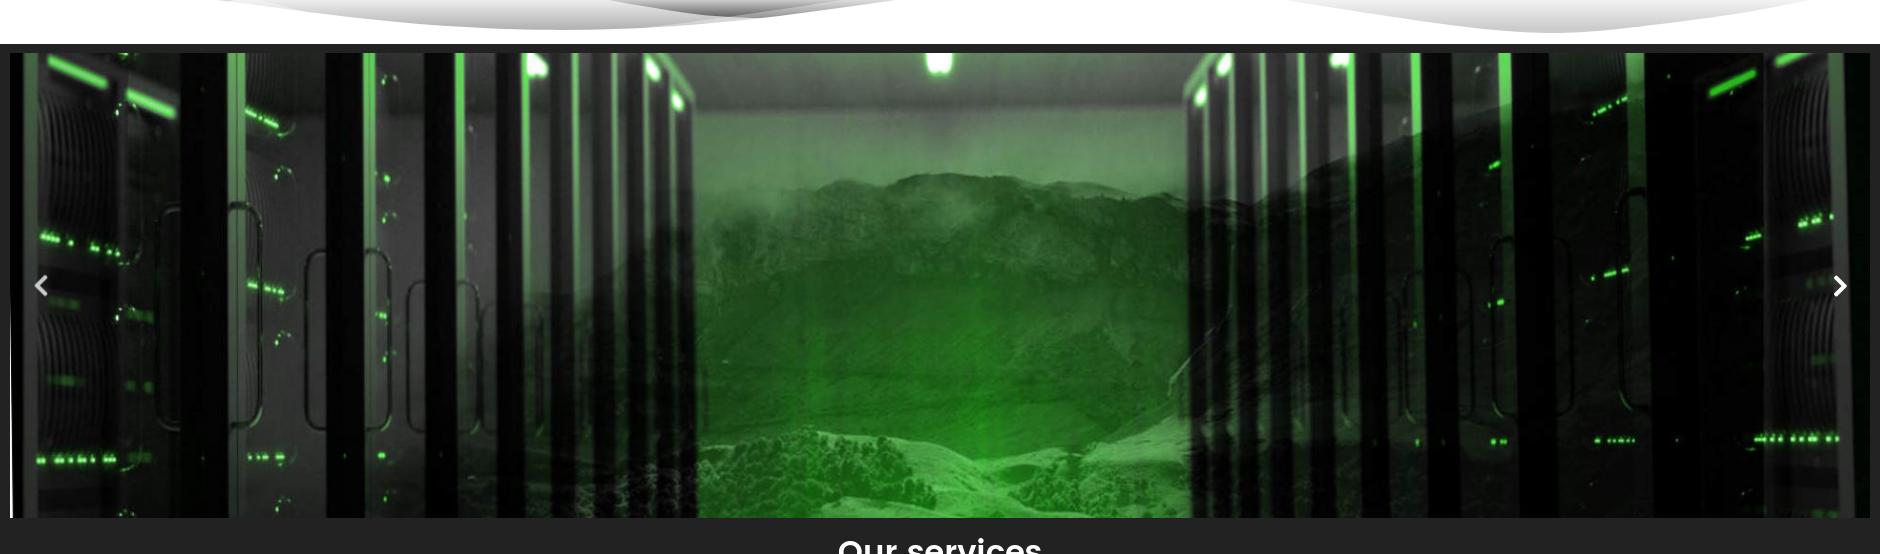 Category Image Green Web Hosting